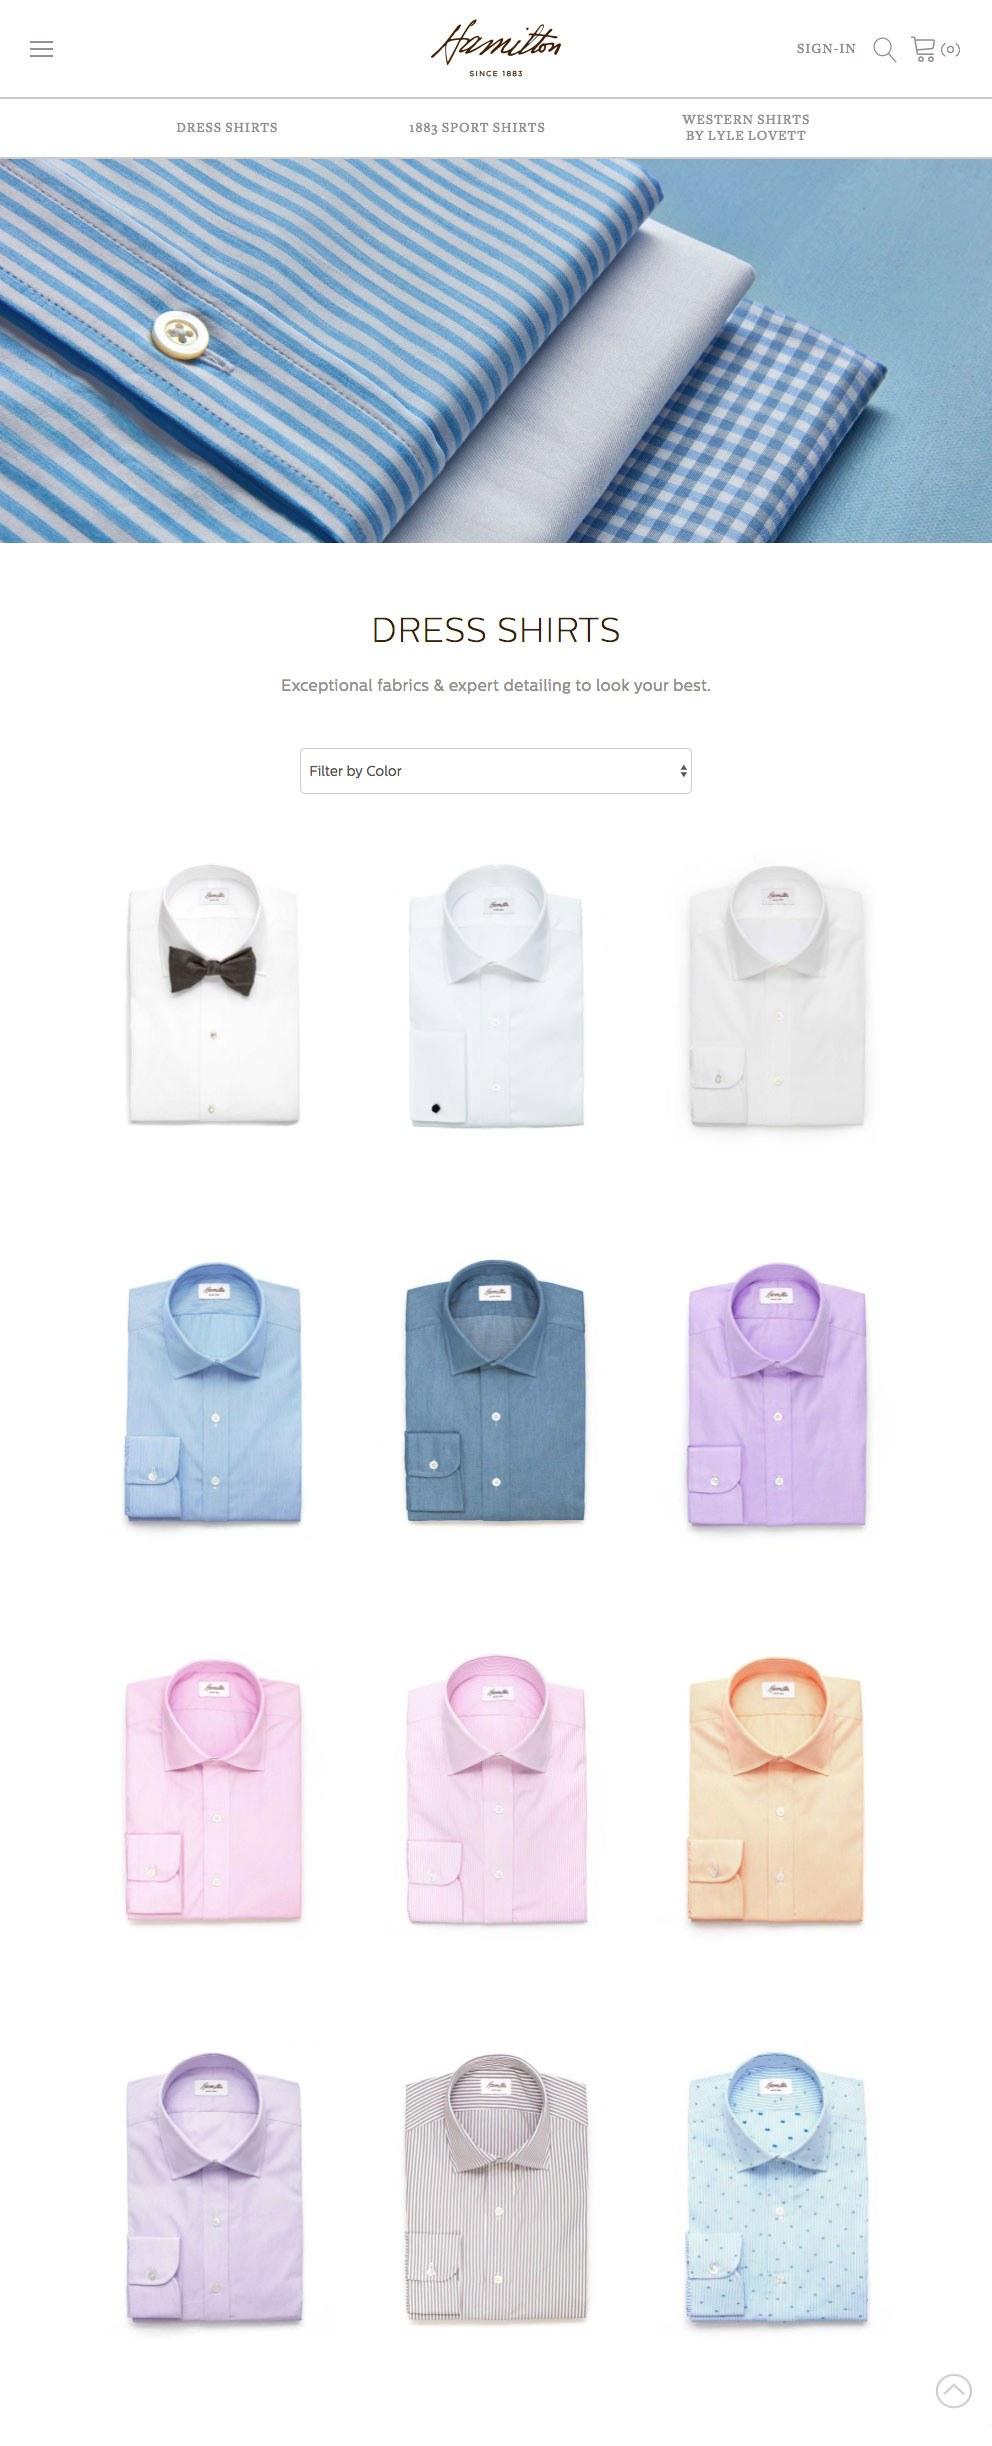 Website Design for Hamilton Shirts